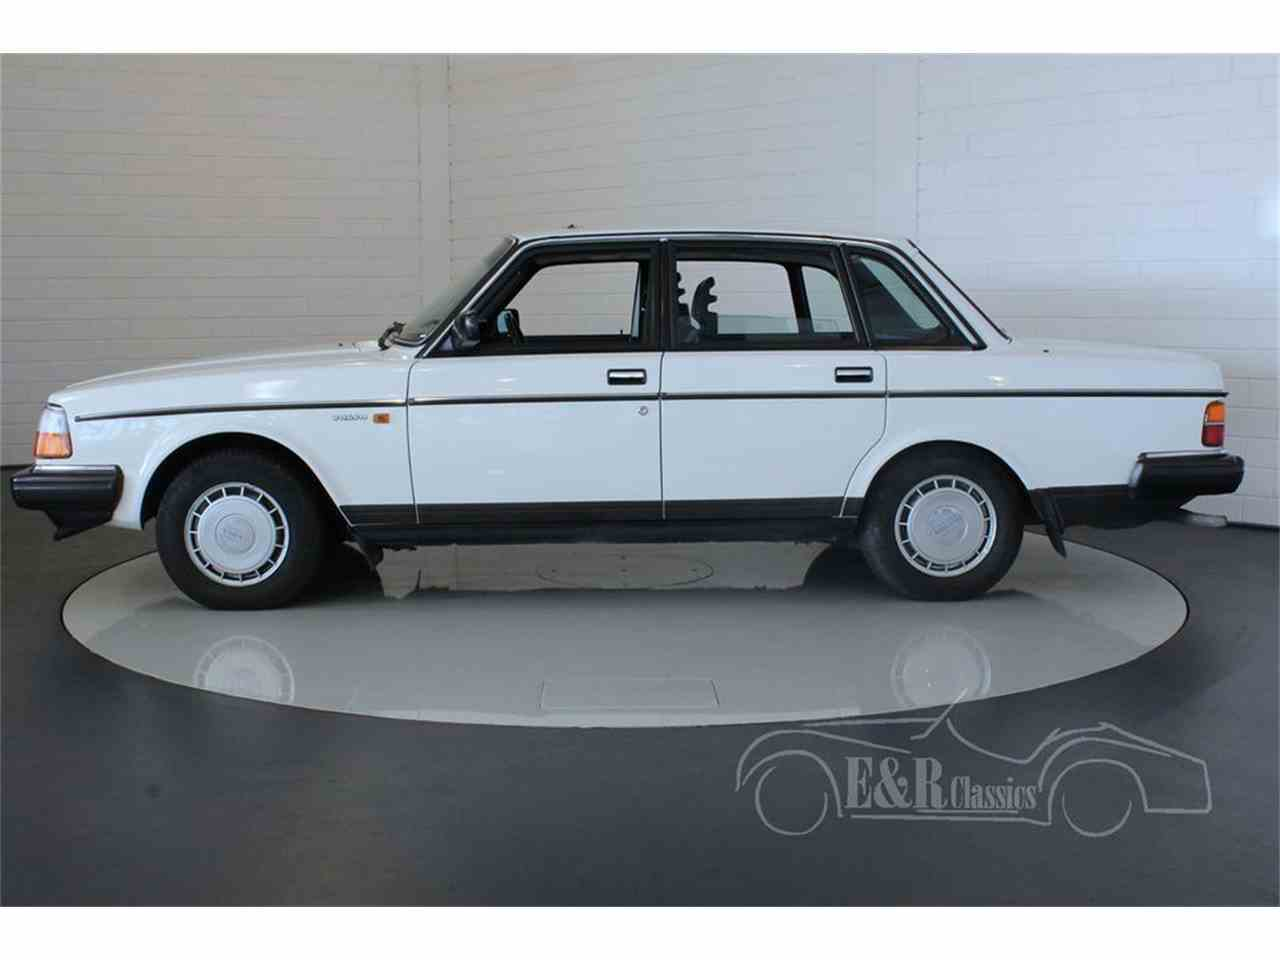 sale cars car near import on for volvo classic classics cadillac michigan